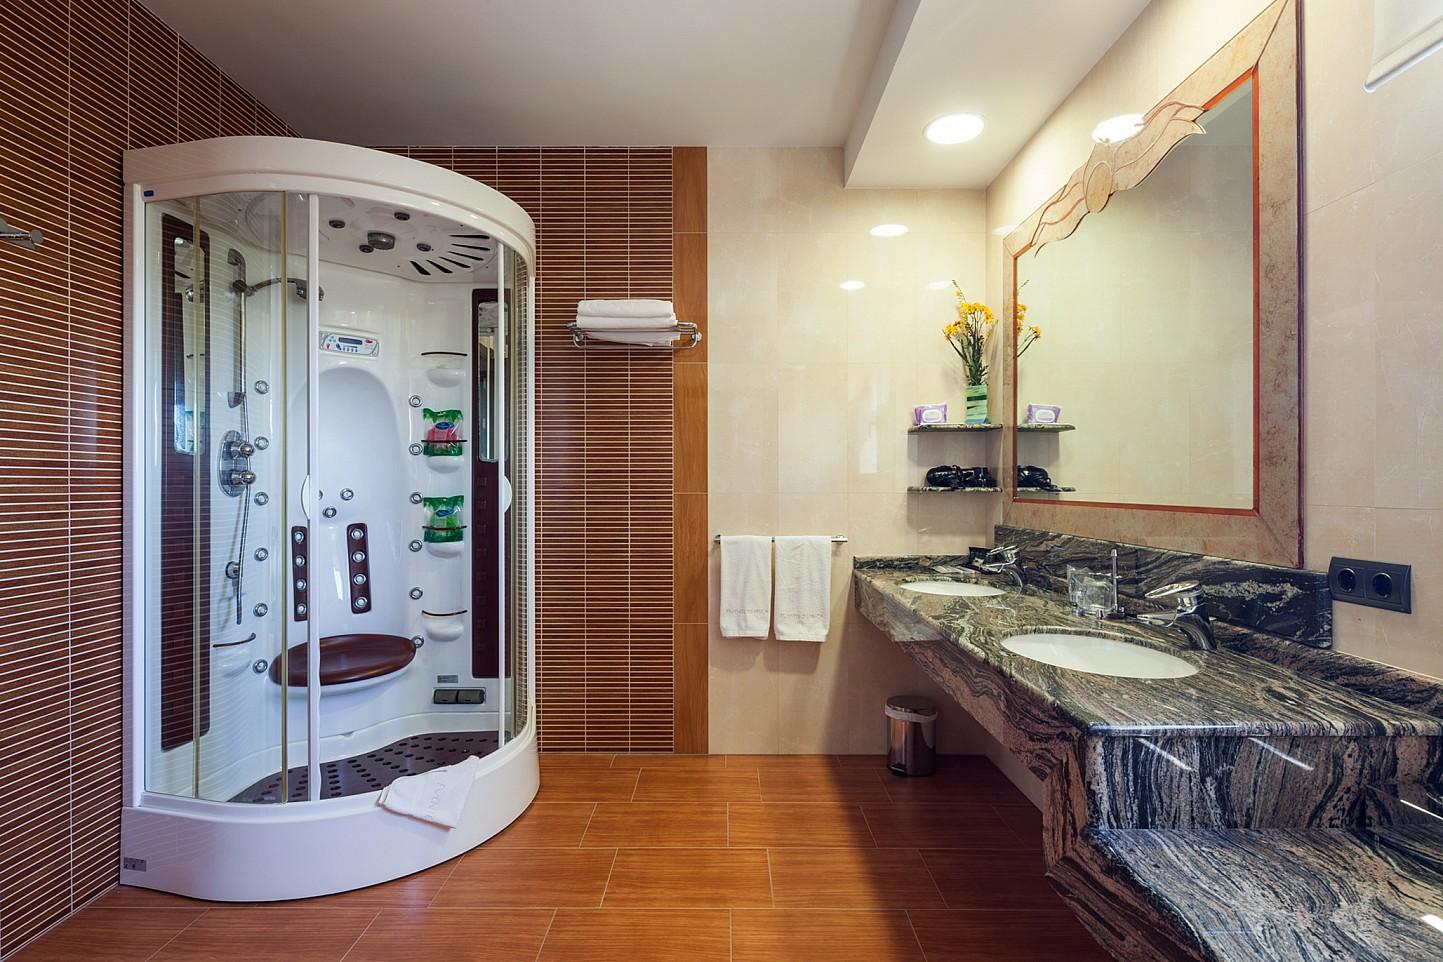 Ванная комната виллы в аренду в Сан Хосе